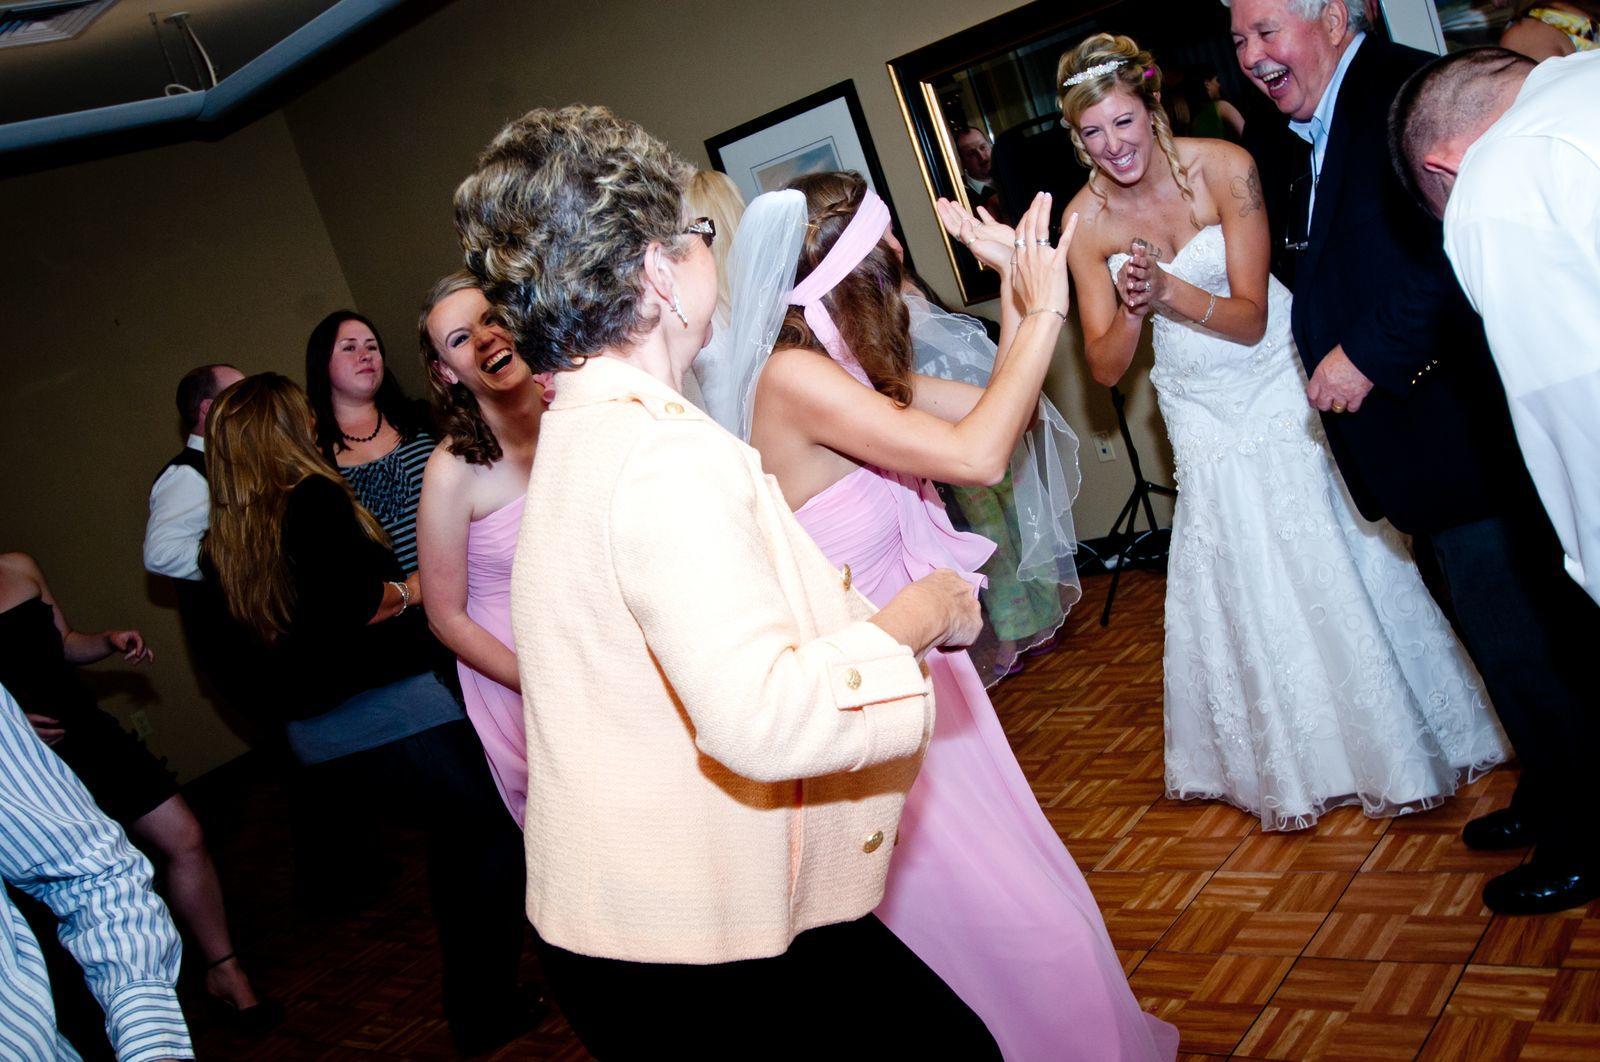 Family dancing at wedding reception.